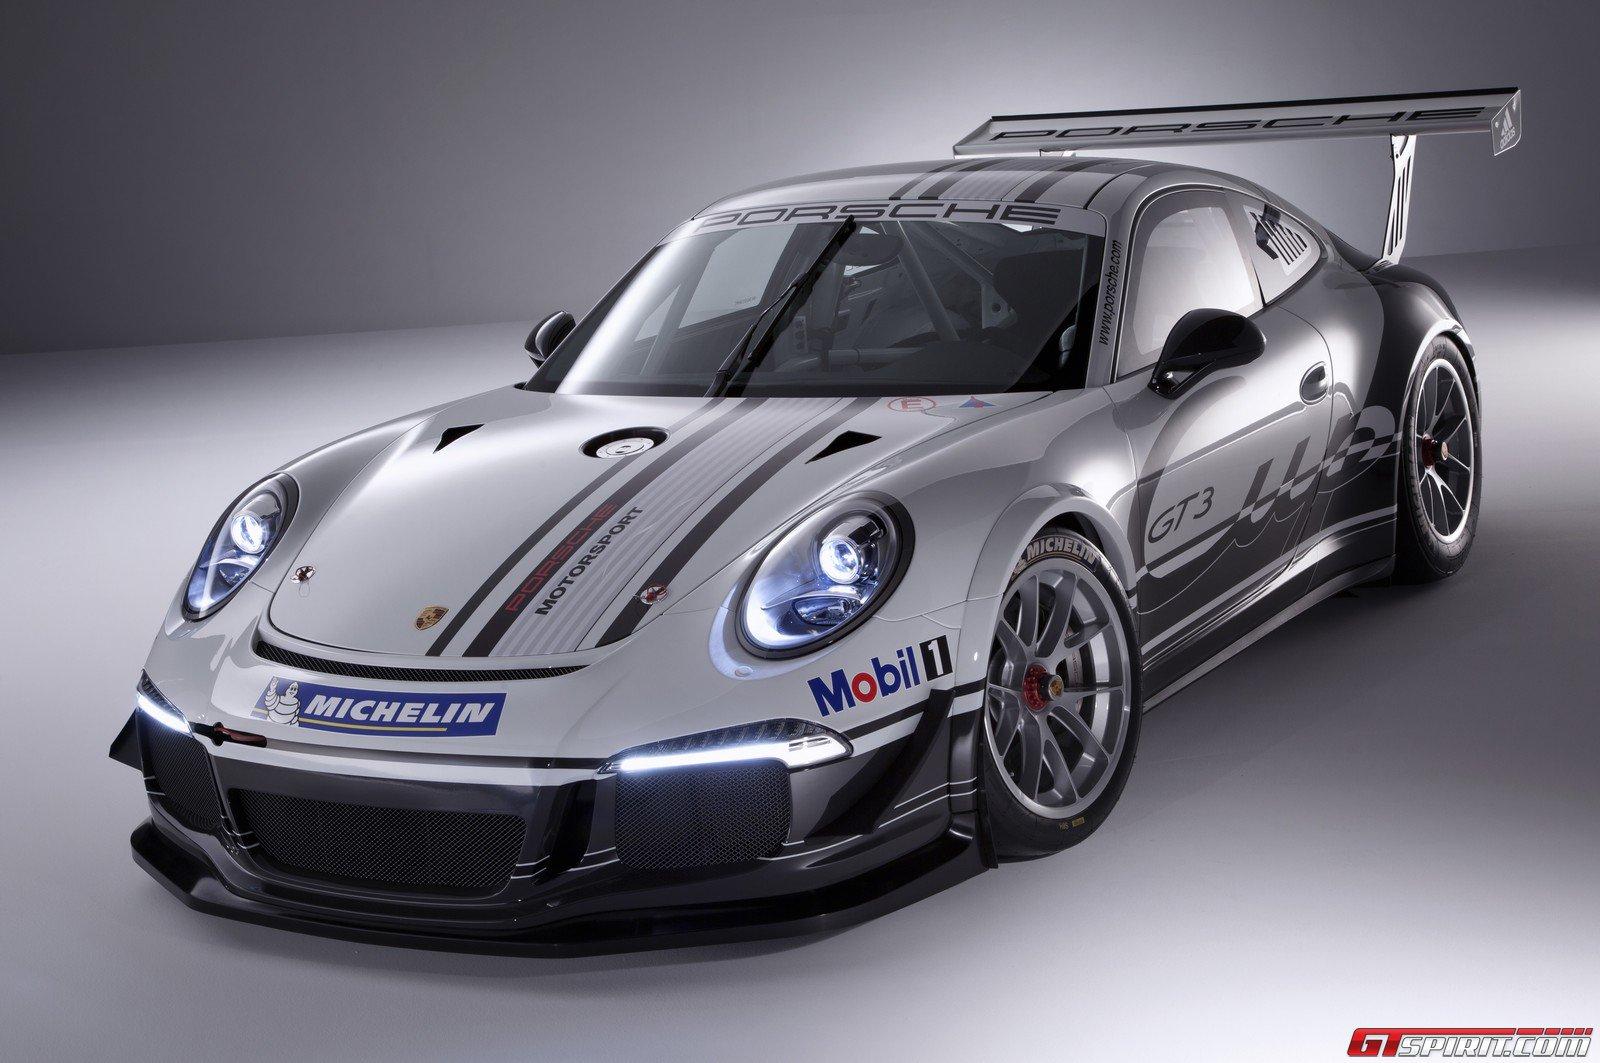 2013 Porsche 911 GT3 Cup Photo 3